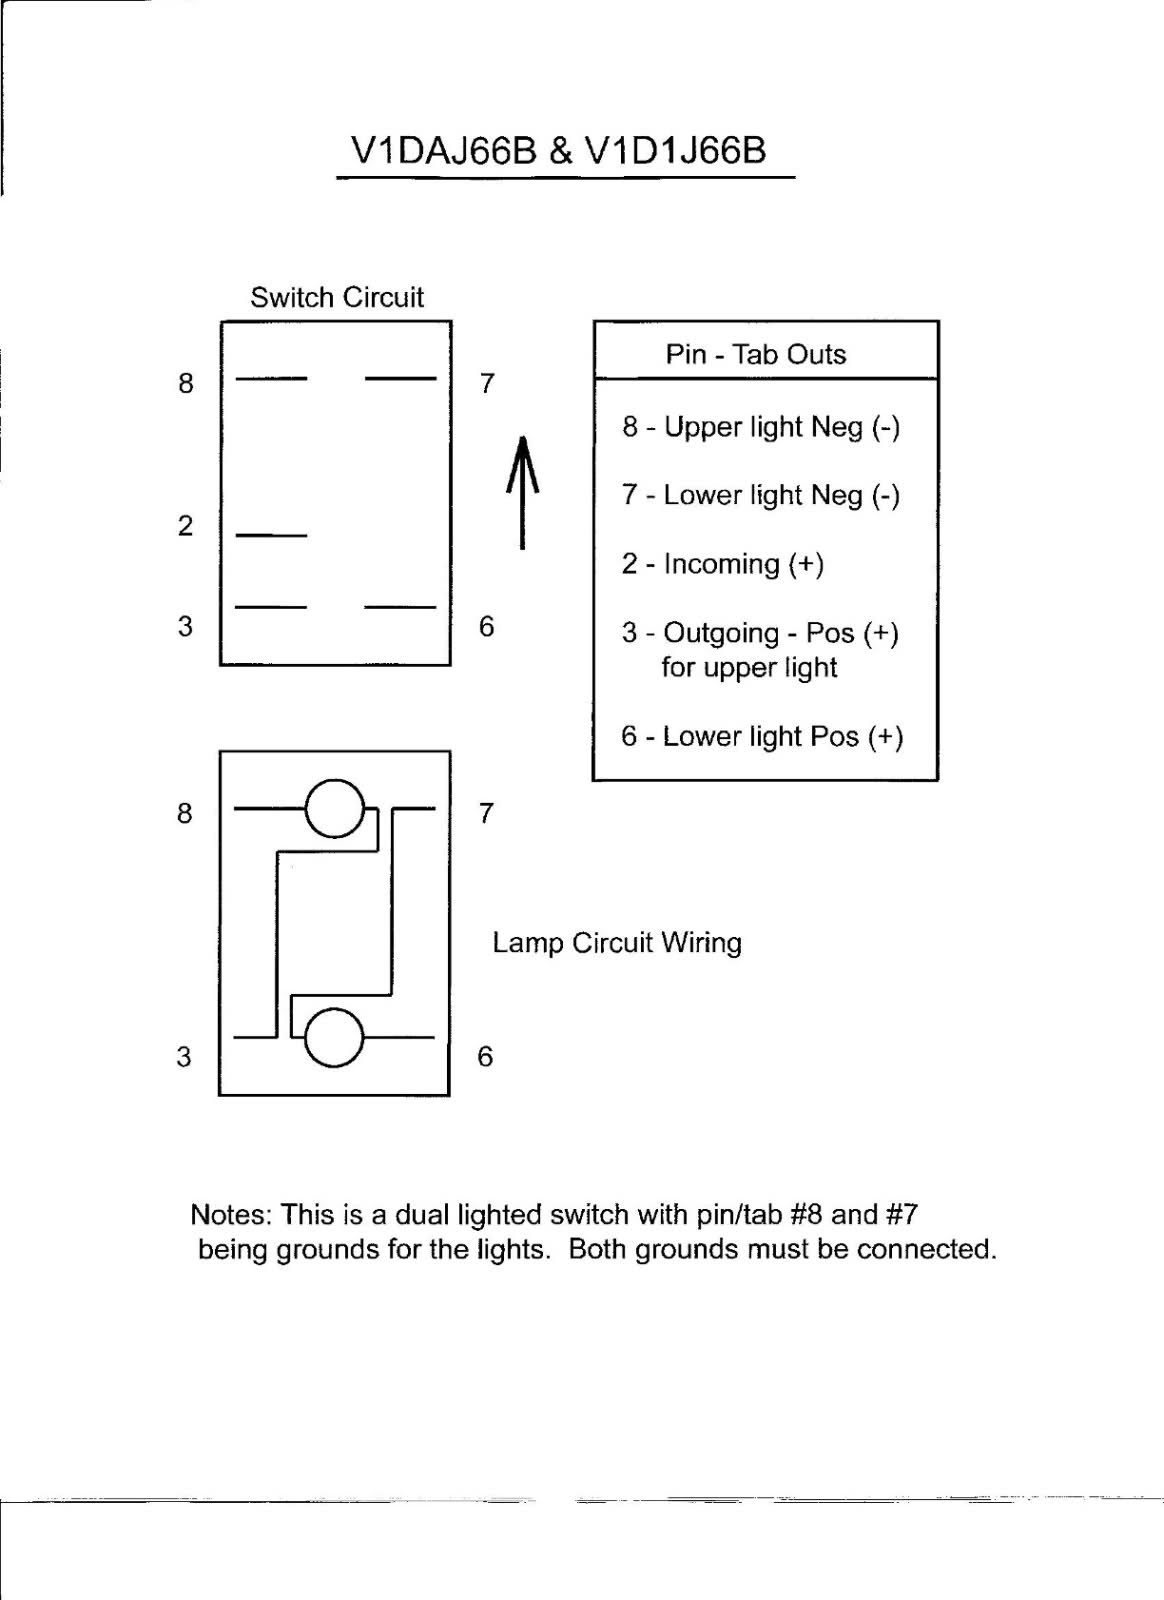 Illuminated Rocker Switch Wiring Diagram | Wiring Diagram - Illuminated Rocker Switch Wiring Diagram